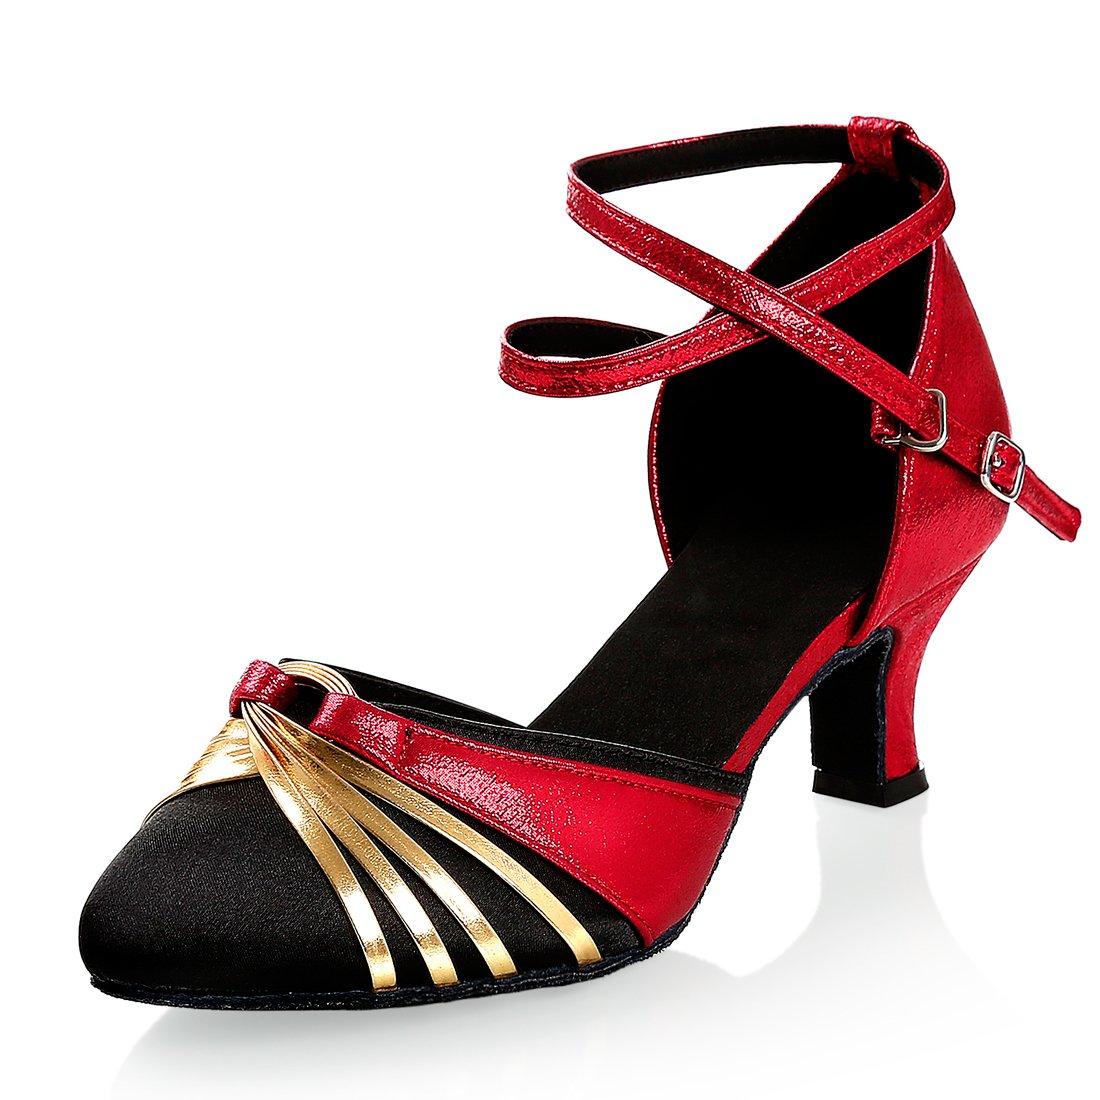 GetMine Women's Latin Dance Shoes Satin Ballroom Salsa Wedding Performance Dance Shoes 2.2'' Heel Red